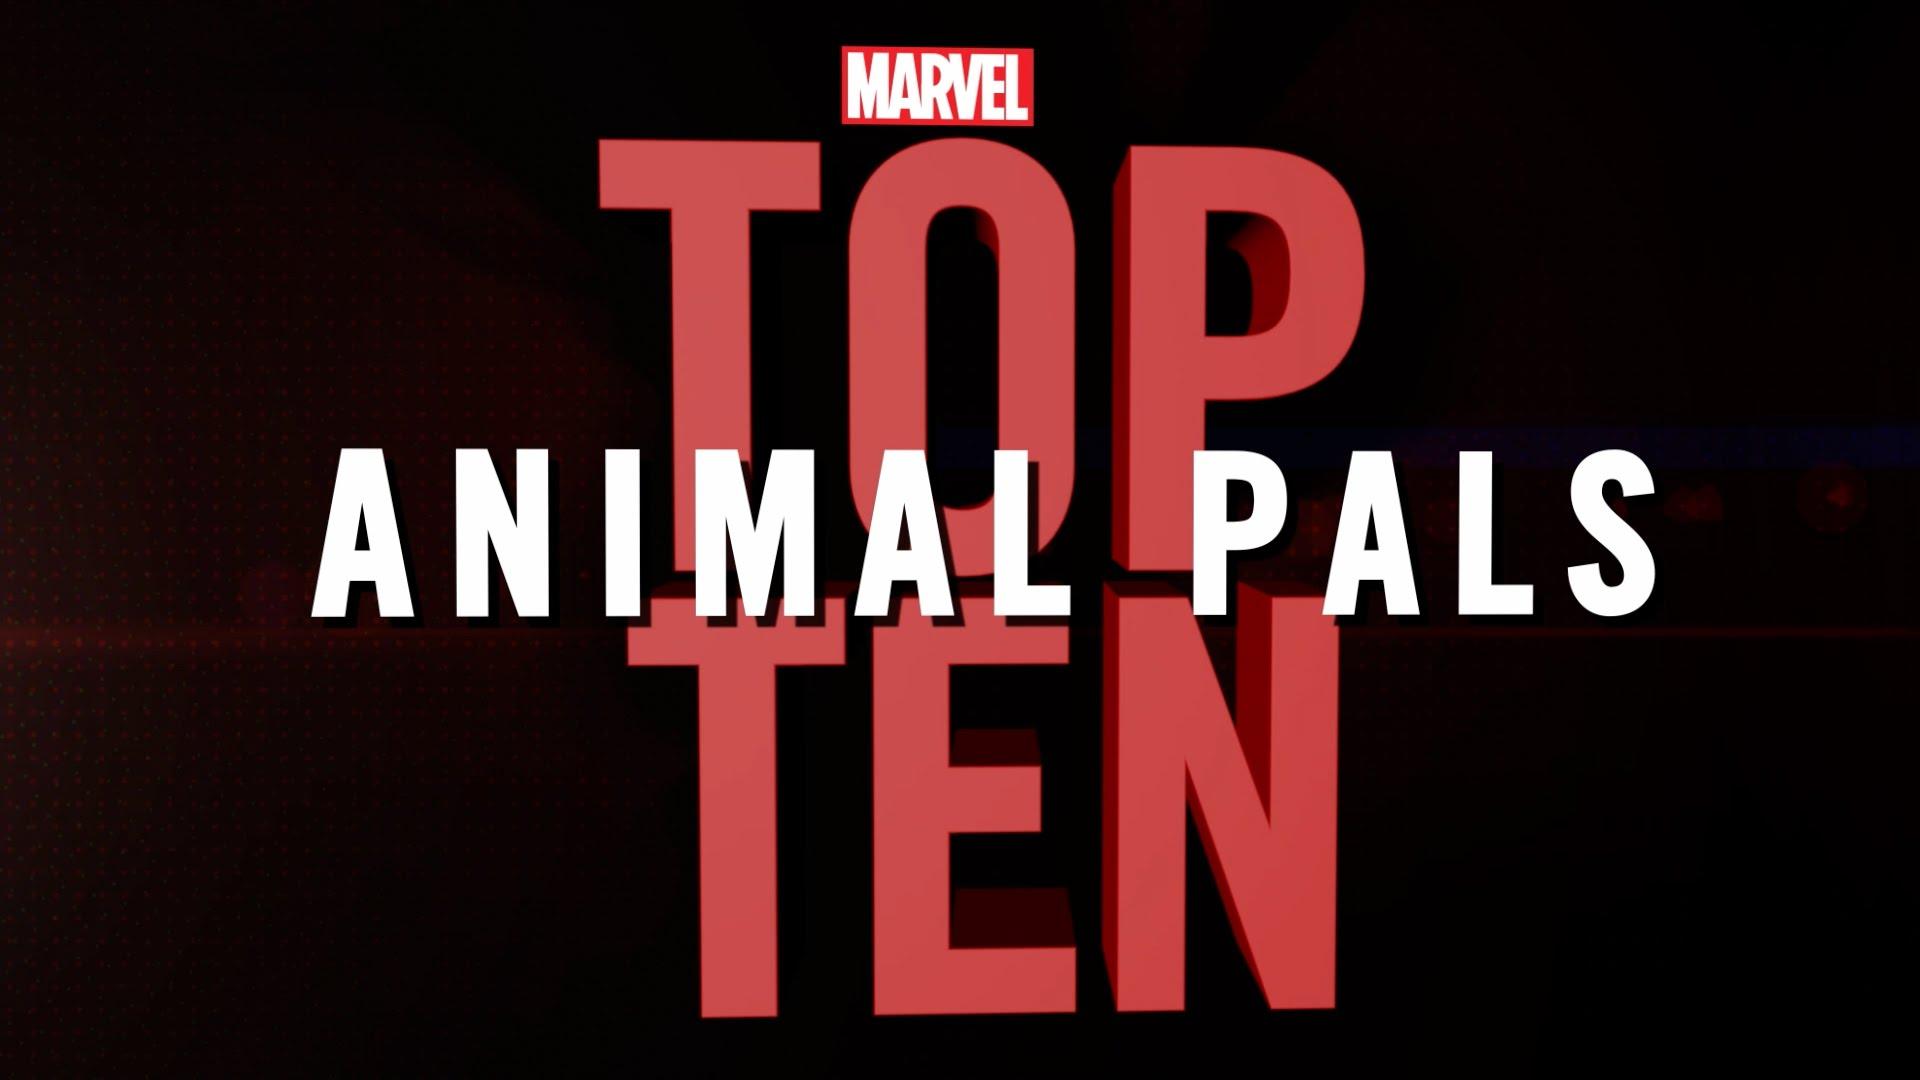 Marvel Top 10 Season 1 9